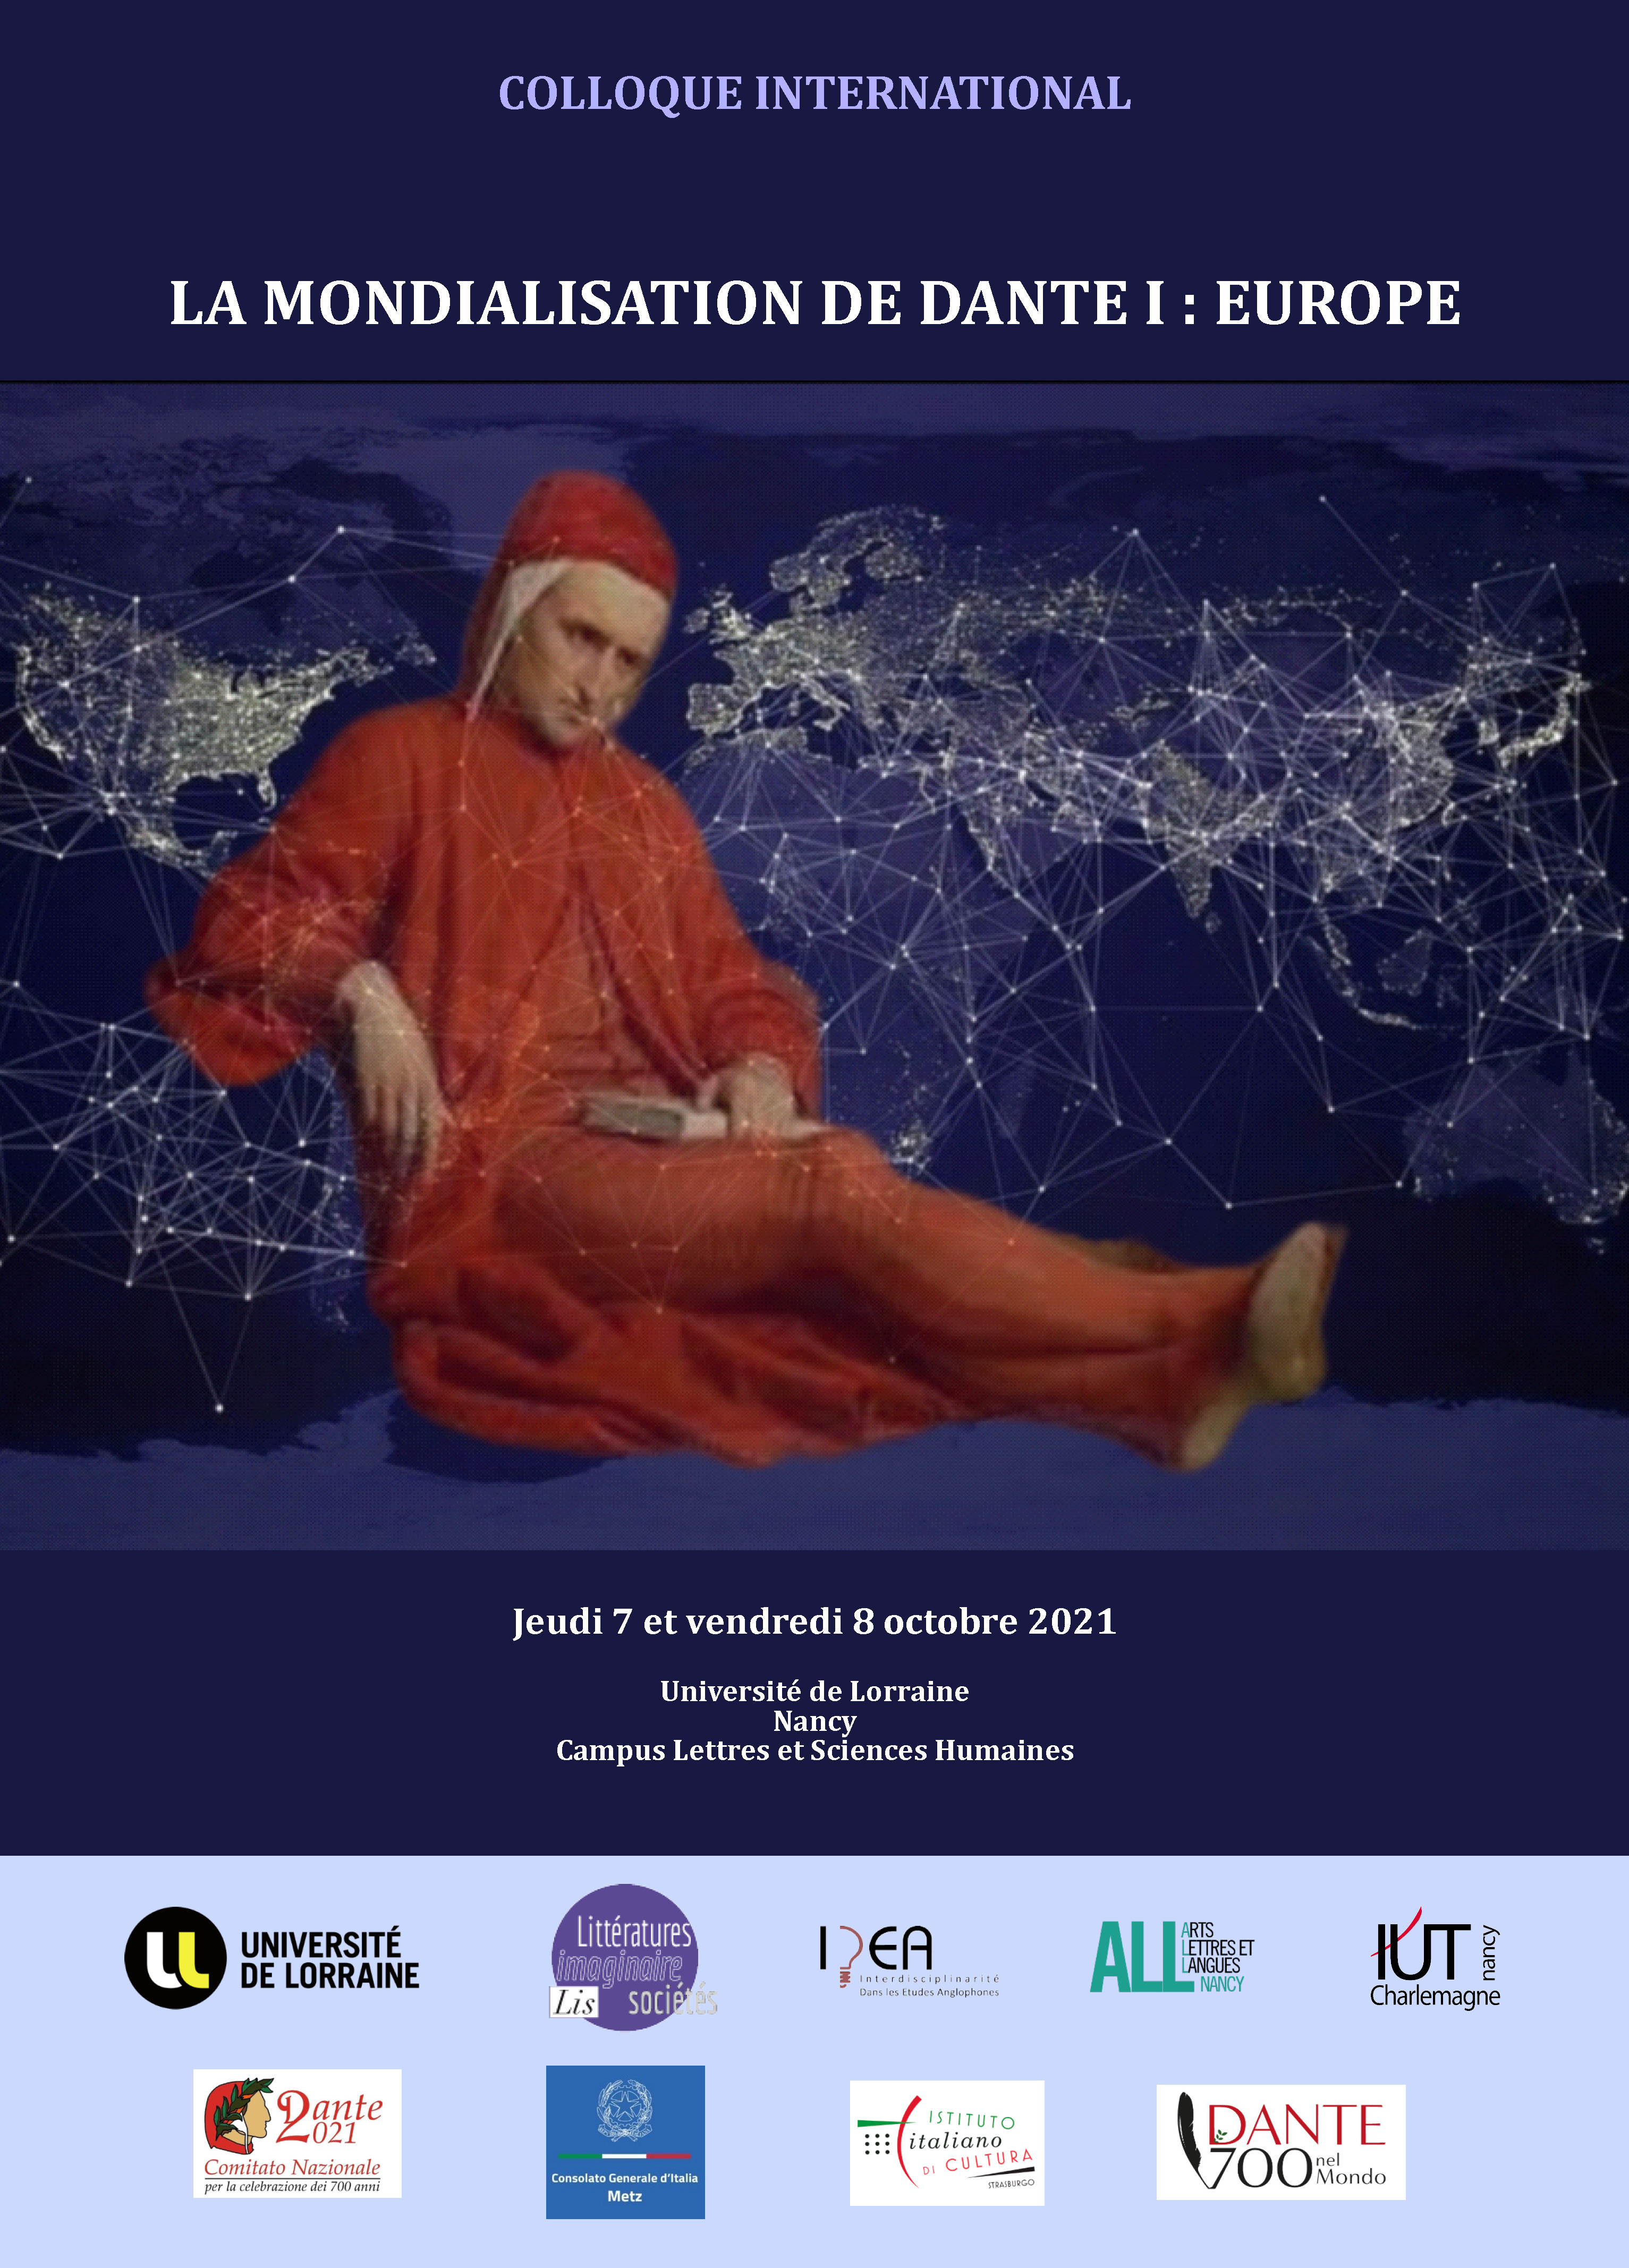 La Mondialisation de Dante I : Europe (Nancy)